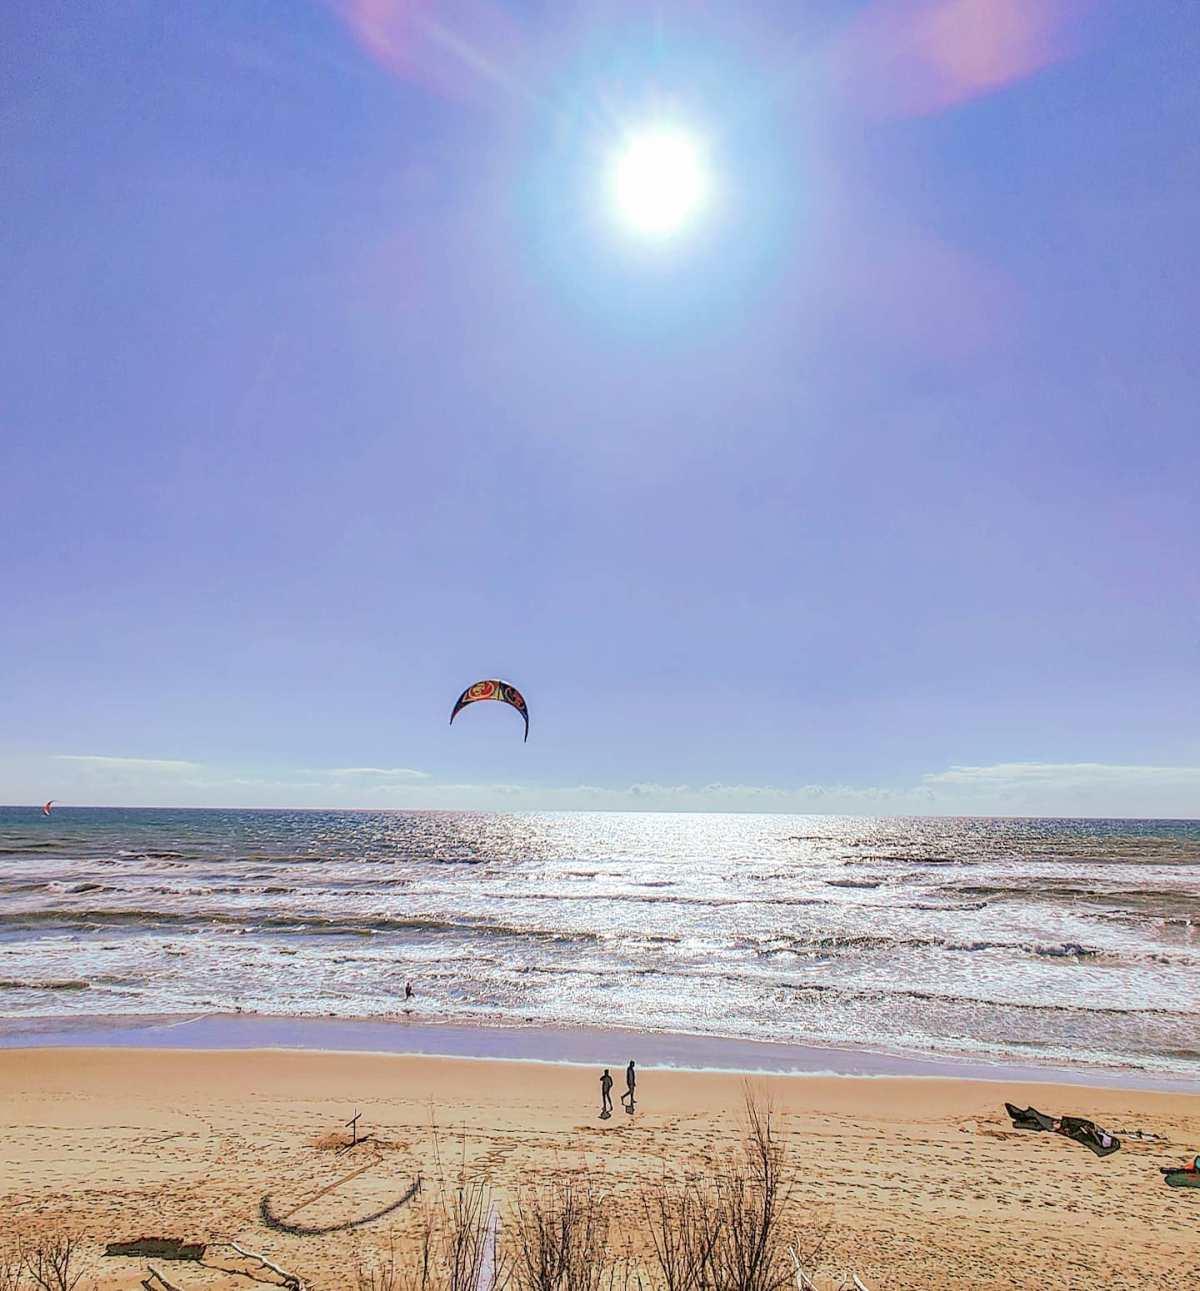 Feel the sea breeze 🪁🤙#sabaudia #italy #Italia #spiaggia #mare #naturelovers #traveltheworld #naturelover #beach #travelholic #traveler #travelawesome #travelling #travel #seaside #sea #beachlife #travelphotography #travelblogger #travels #traveller #naturephotography #travelgram #traveling #kitesurfing #kite #kitesurf #nature